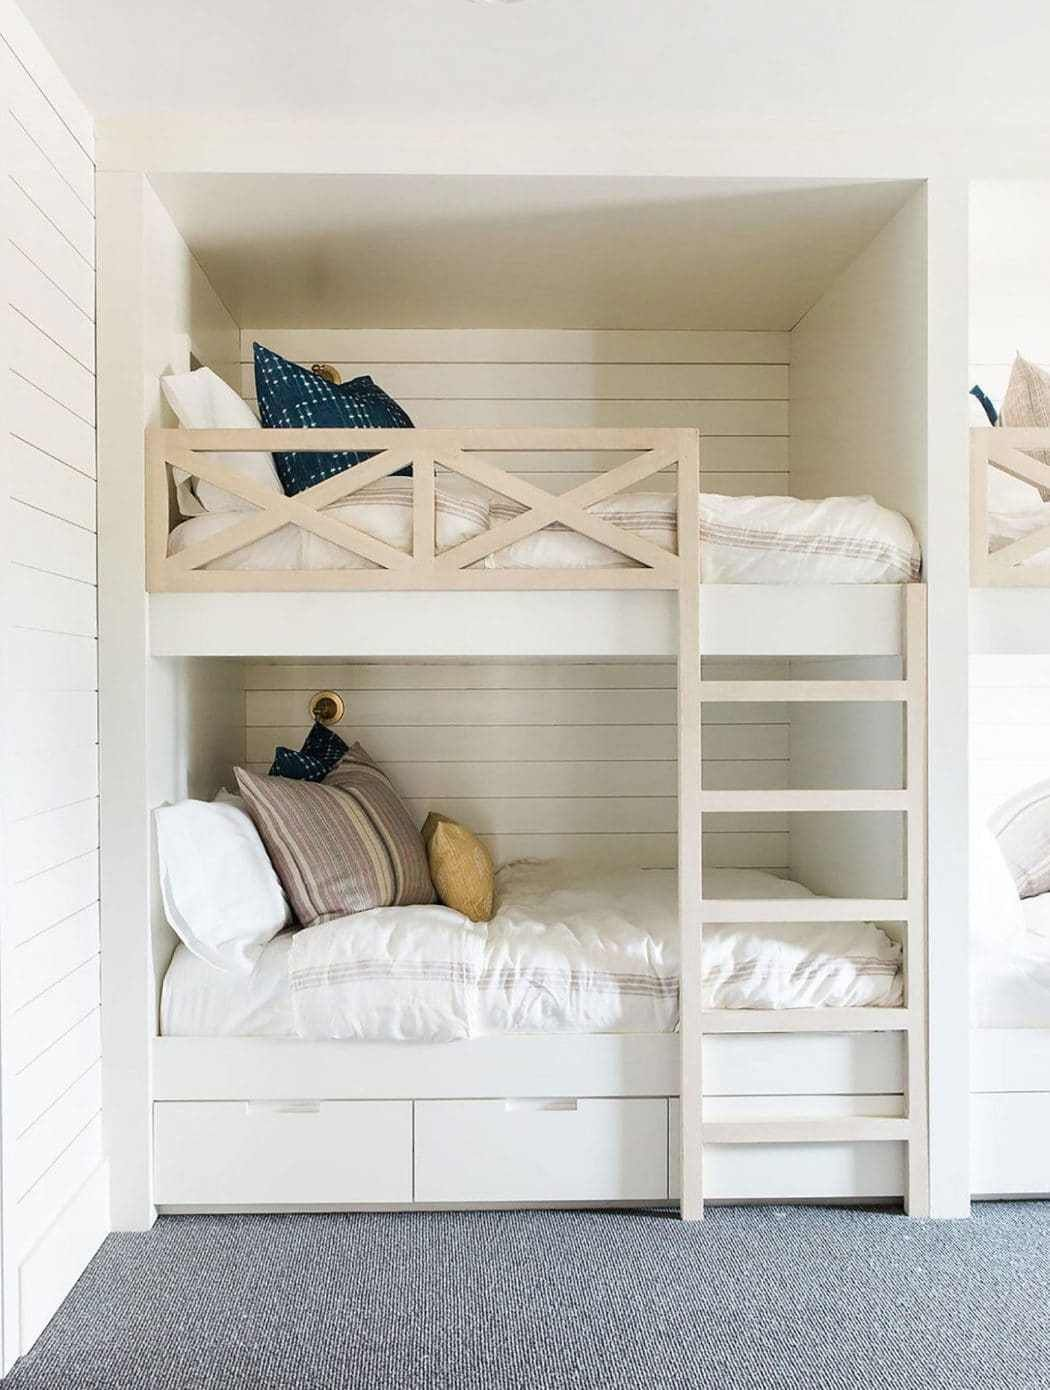 how to make diy built in bunk beds bunk bed trundle bunk beds rh pinterest com bunk bed room inspiration loft bed inspiration ideas